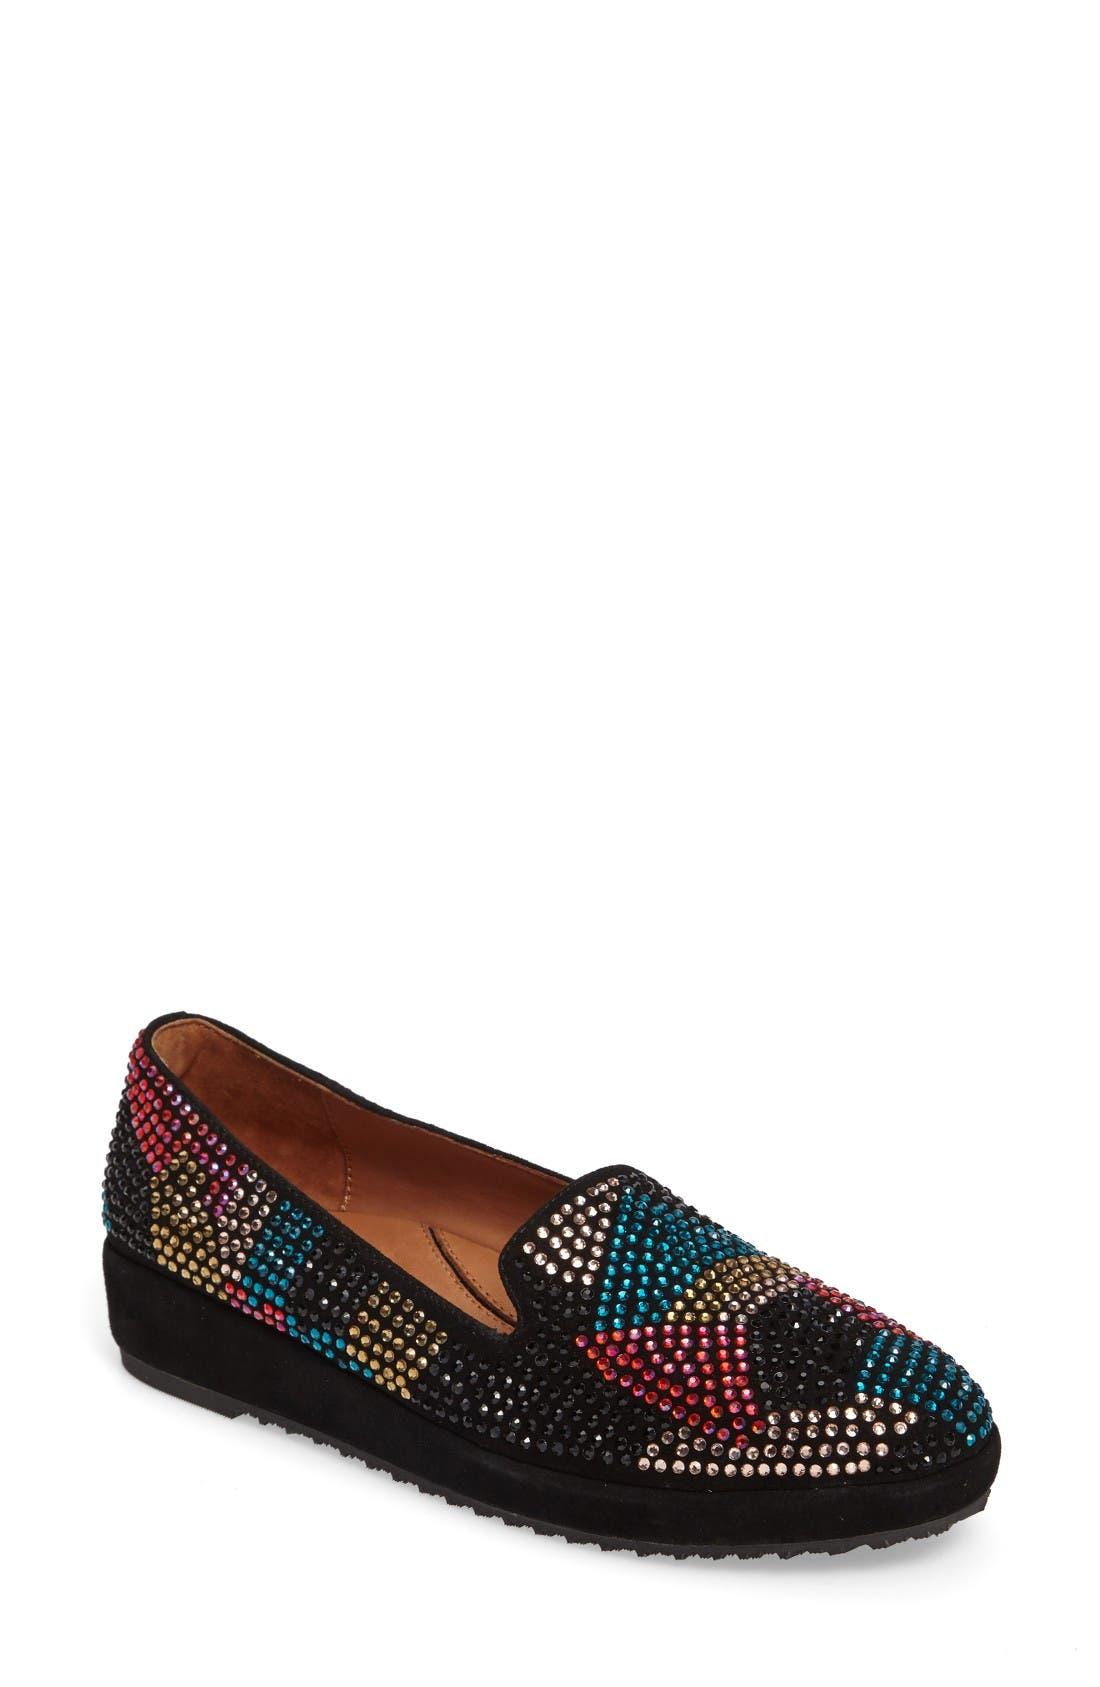 Correze Wedge Slip-On,                         Main,                         color, Black Multi Suede